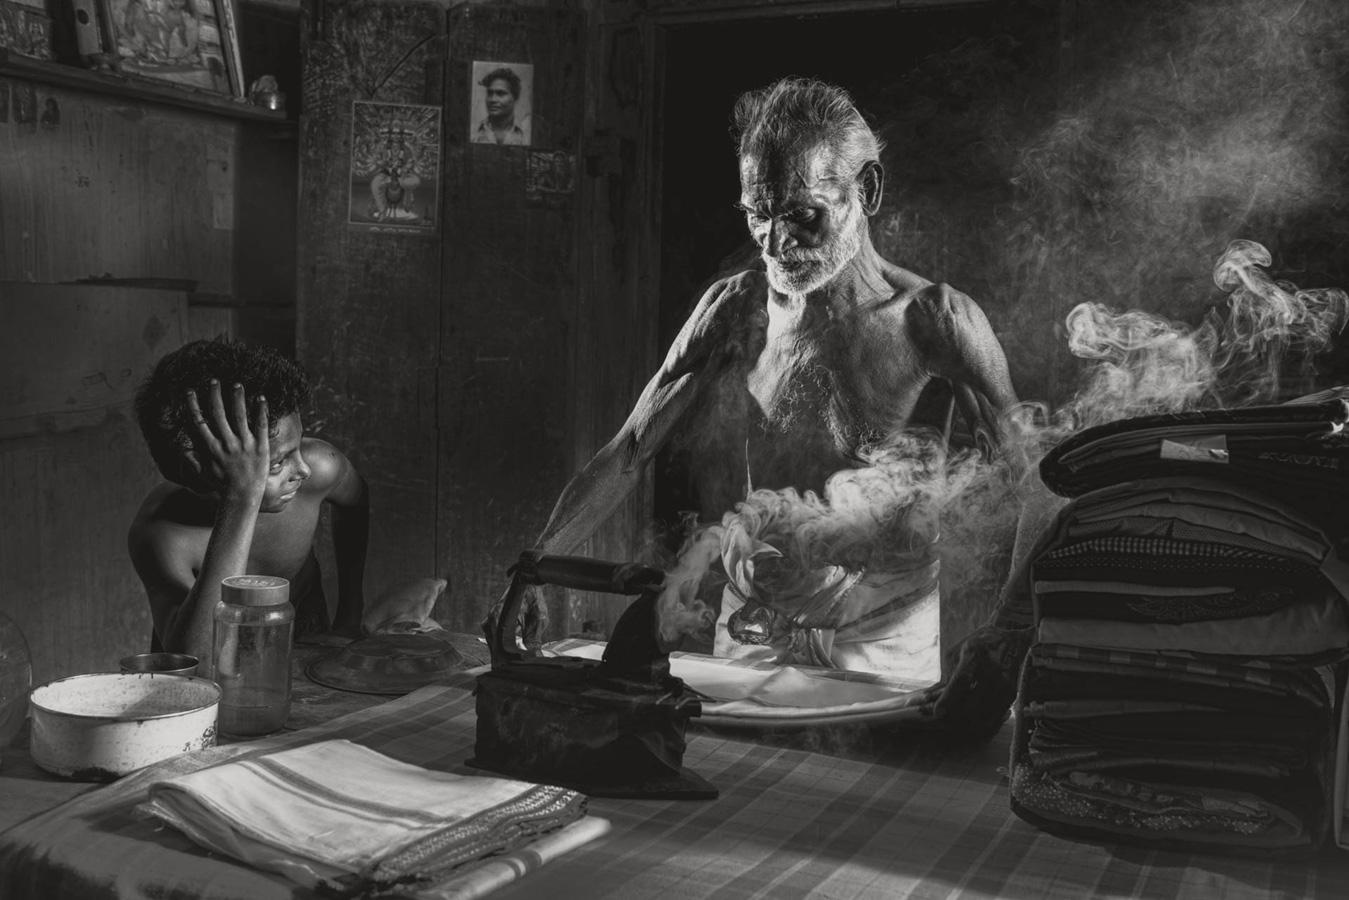 Палиса С. Виракун / Palitha S. Weerakoon, Победитель в категории «Люди», Фотоконкурс Oasis Photo Contest